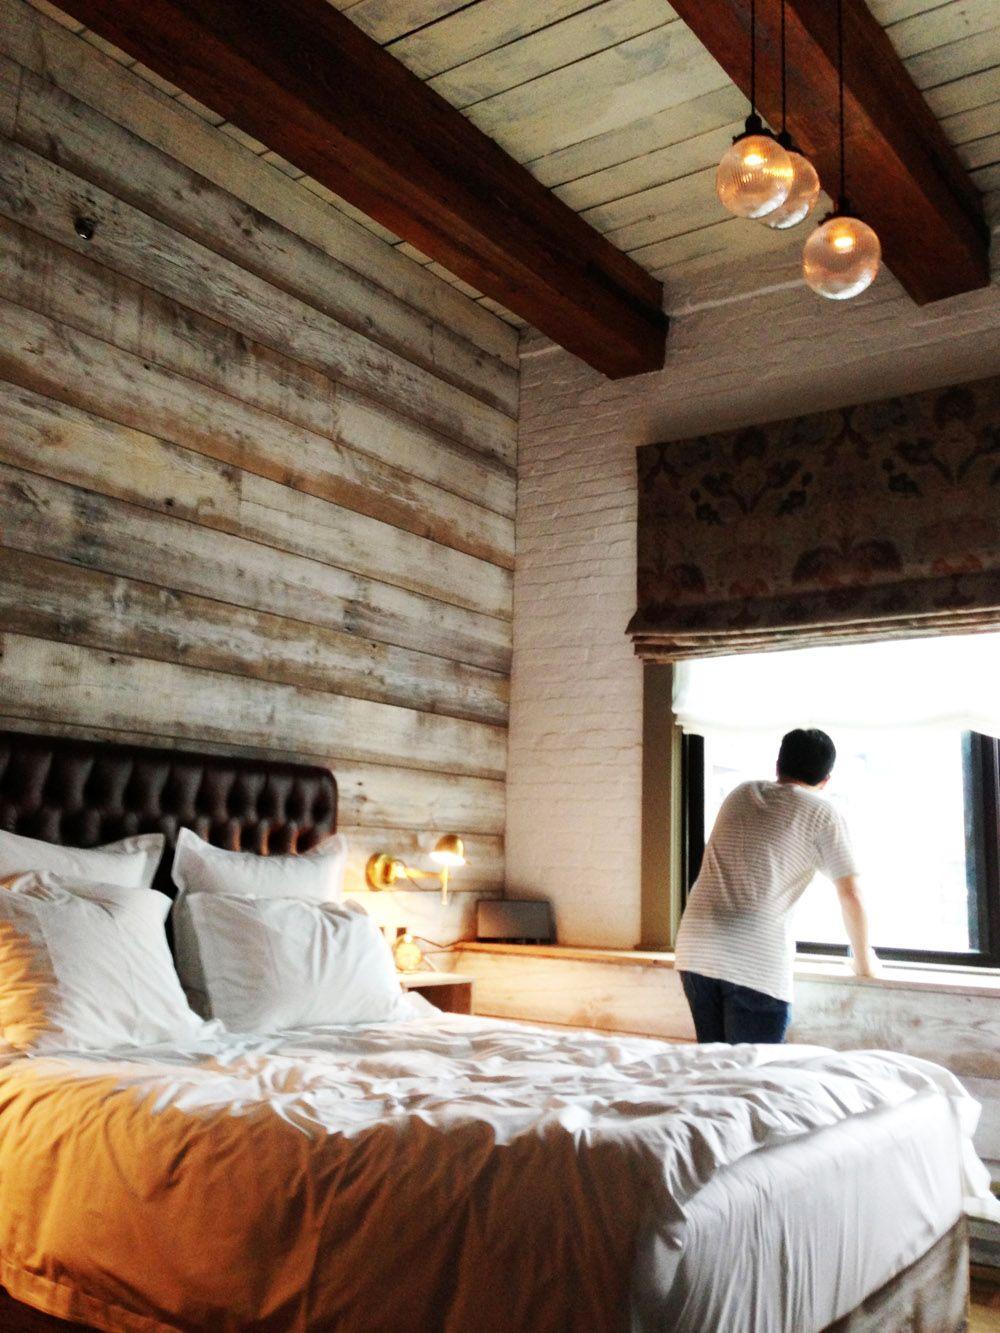 Soho House NYC Wooden Paneling Beams Exposed Brick Hanging - Contemporary soho loft with exposed brick and wood beams